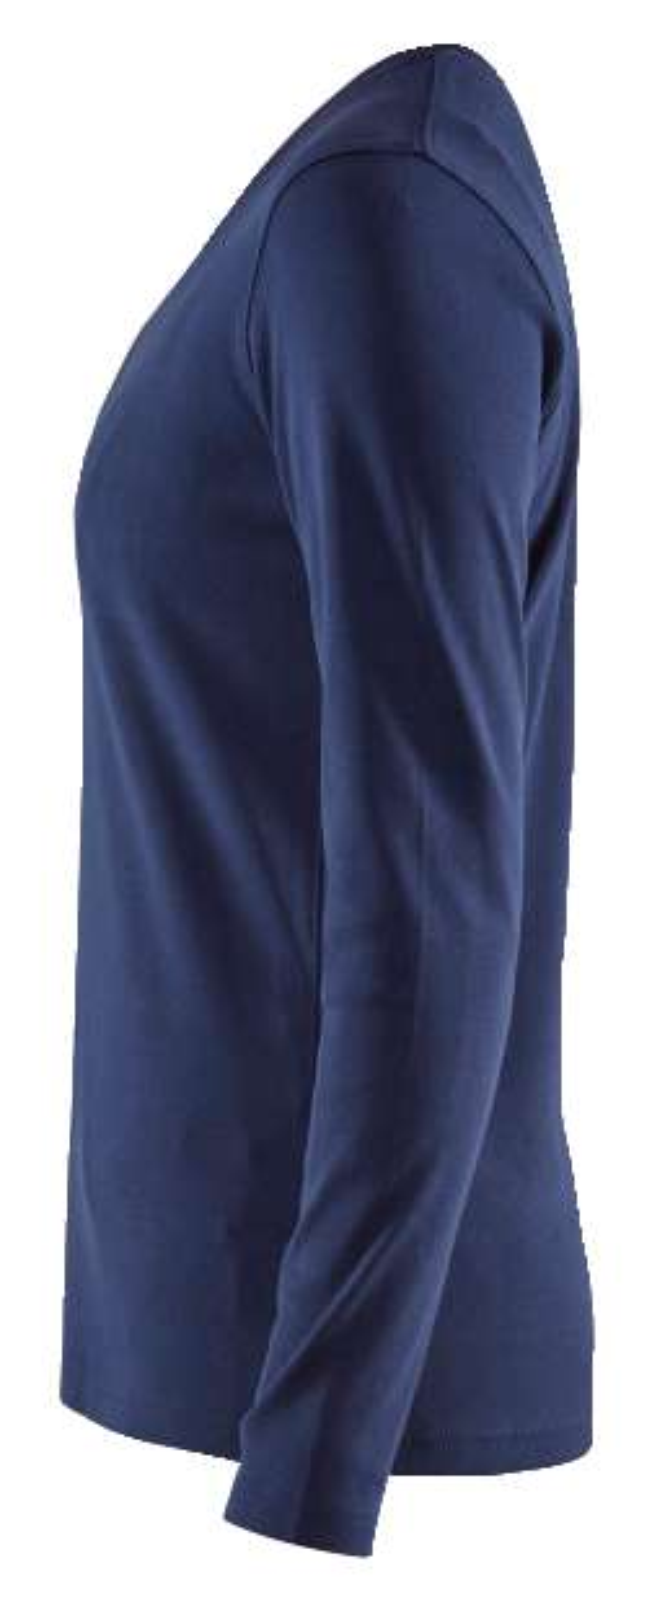 Blaklader Dames T-shirts 33011032 marineblauw(8900)